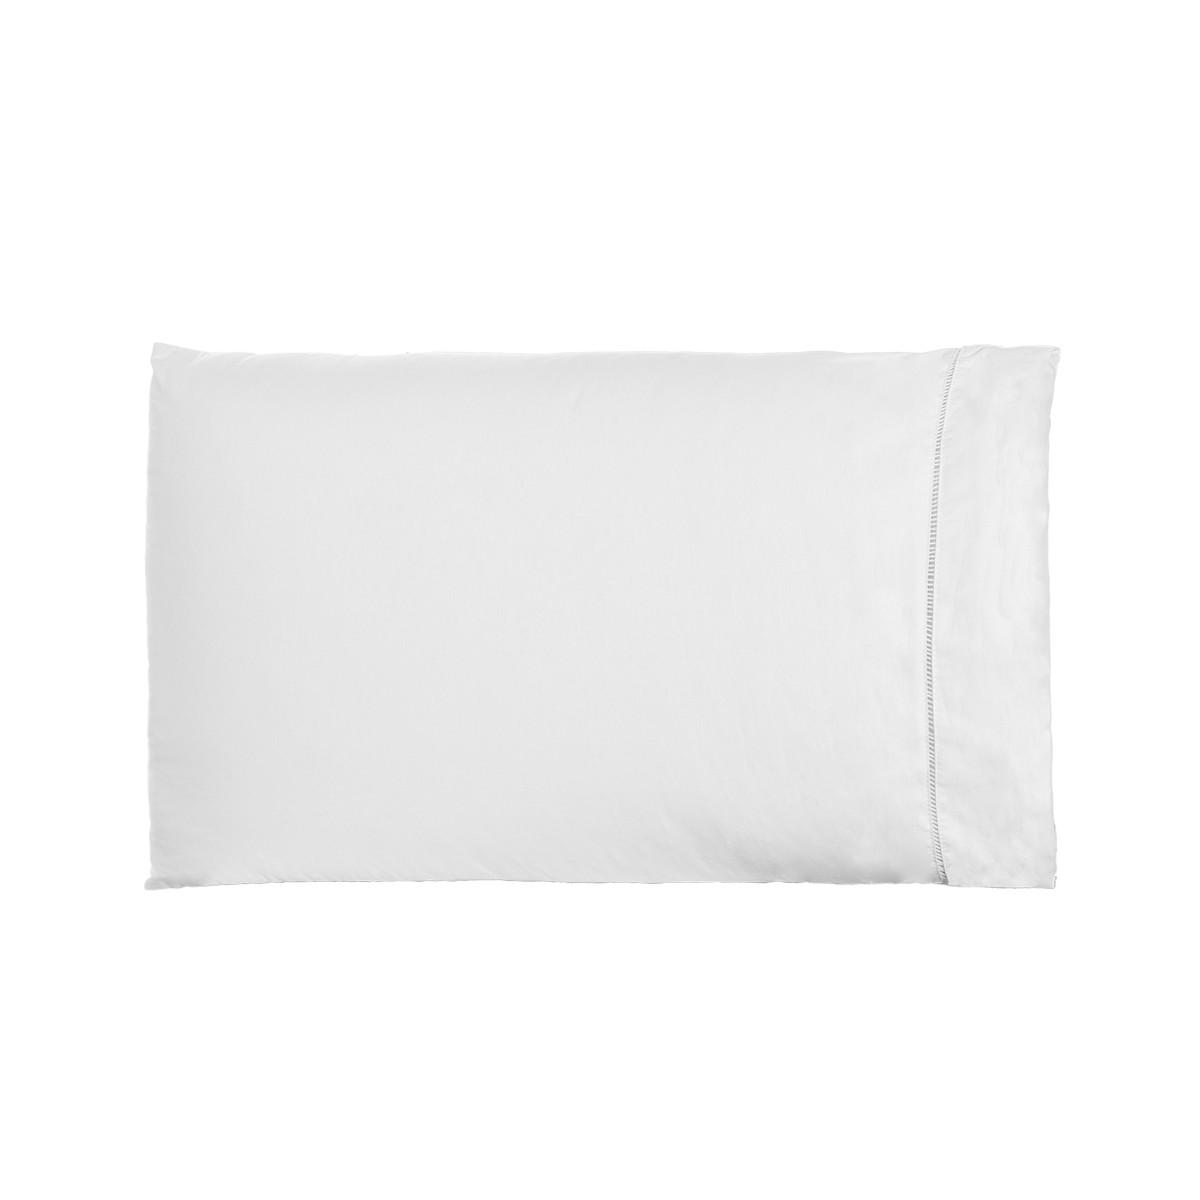 Fronha Classic 50 x 70 cm Percal 200 Fios Branco - Juma